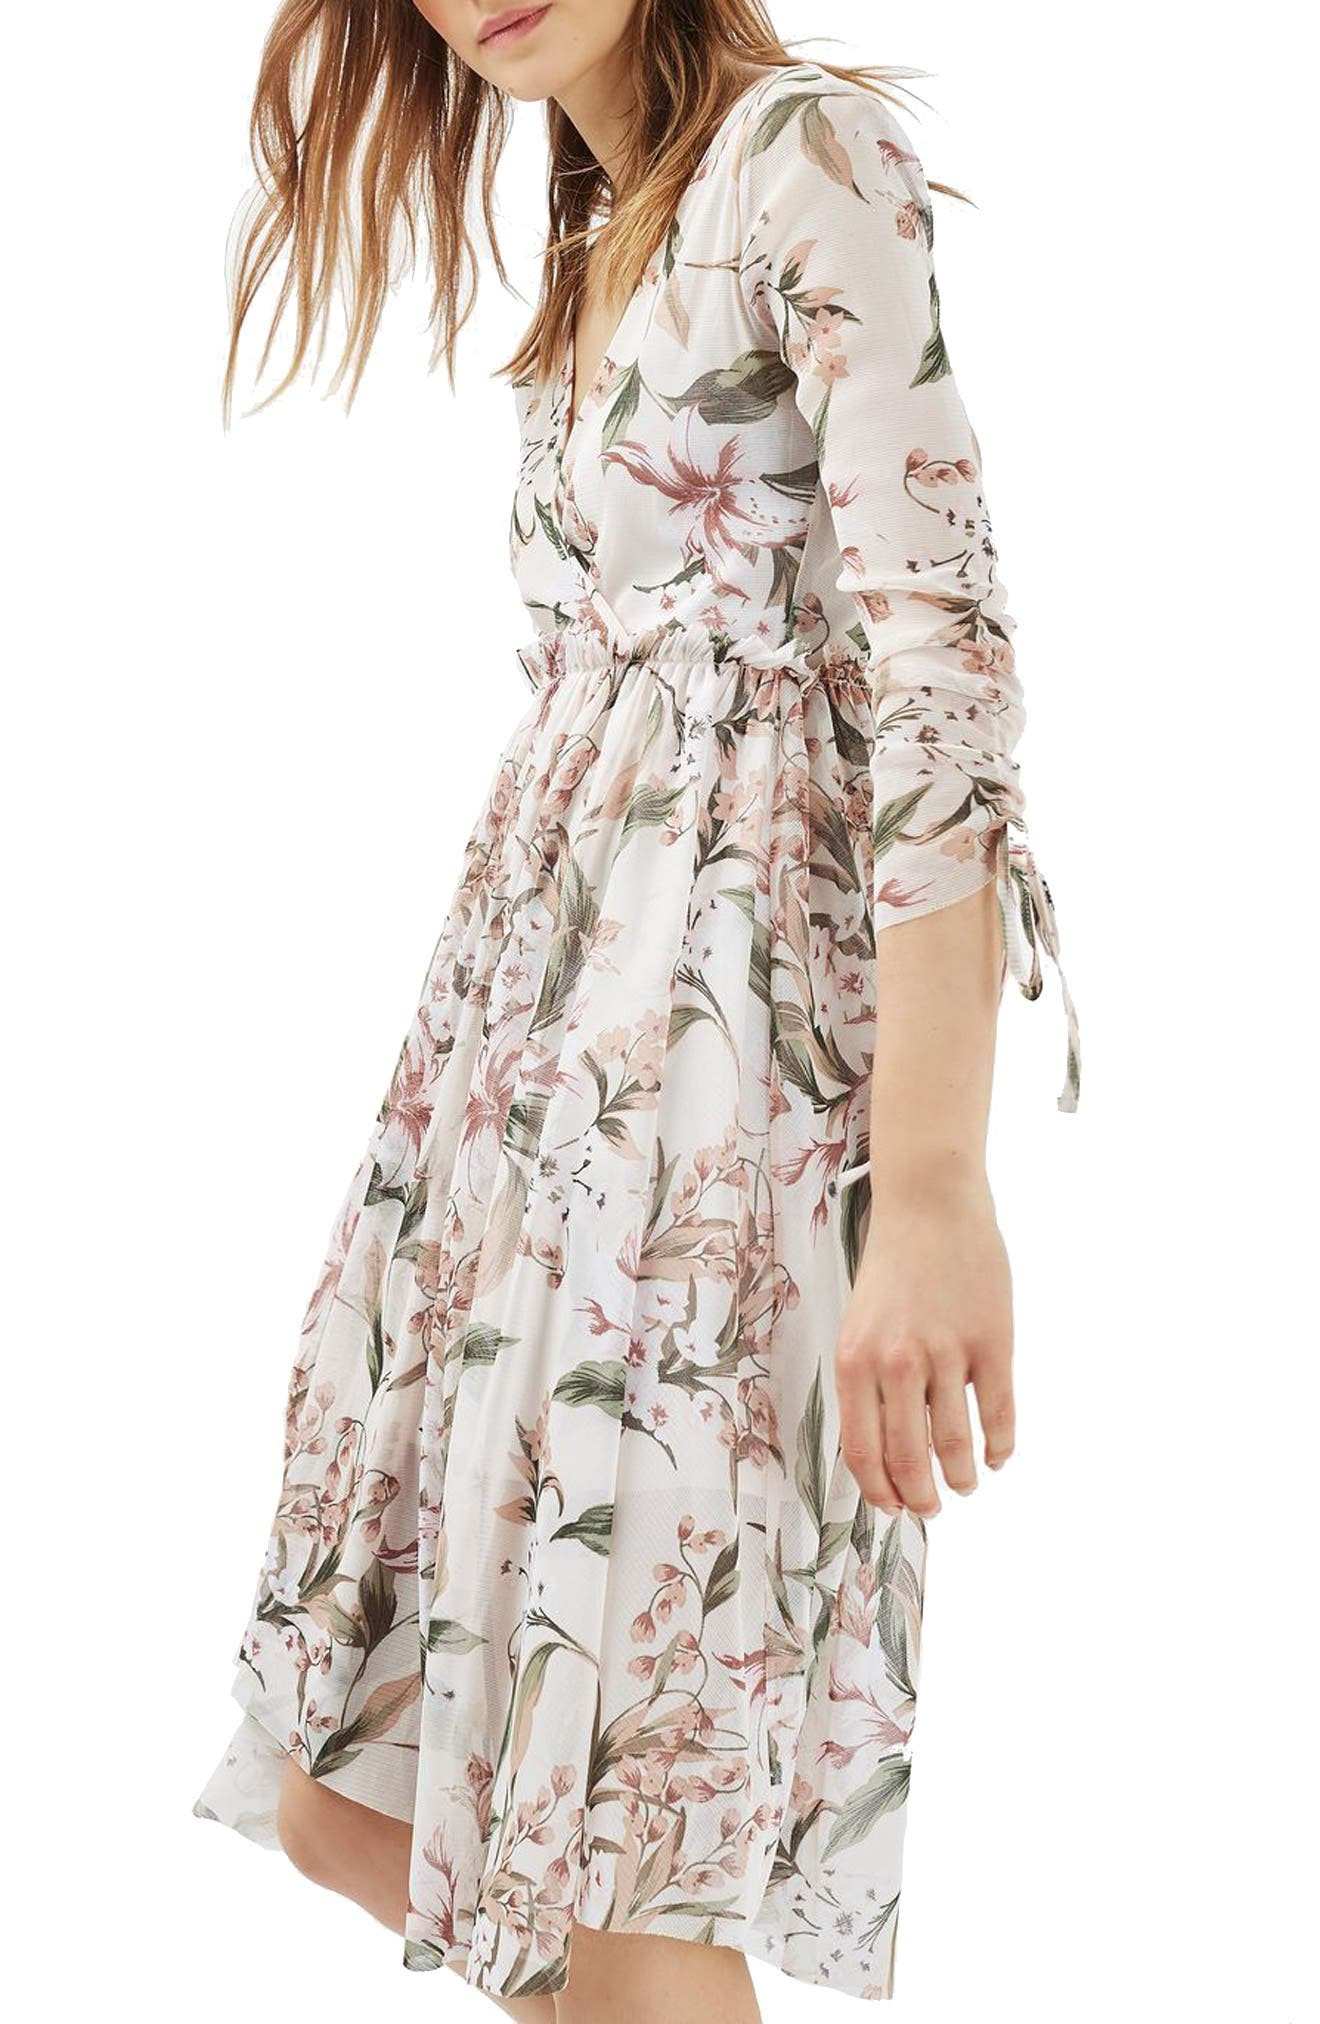 Lily Floral Mesh Dress,                             Alternate thumbnail 3, color,                             900